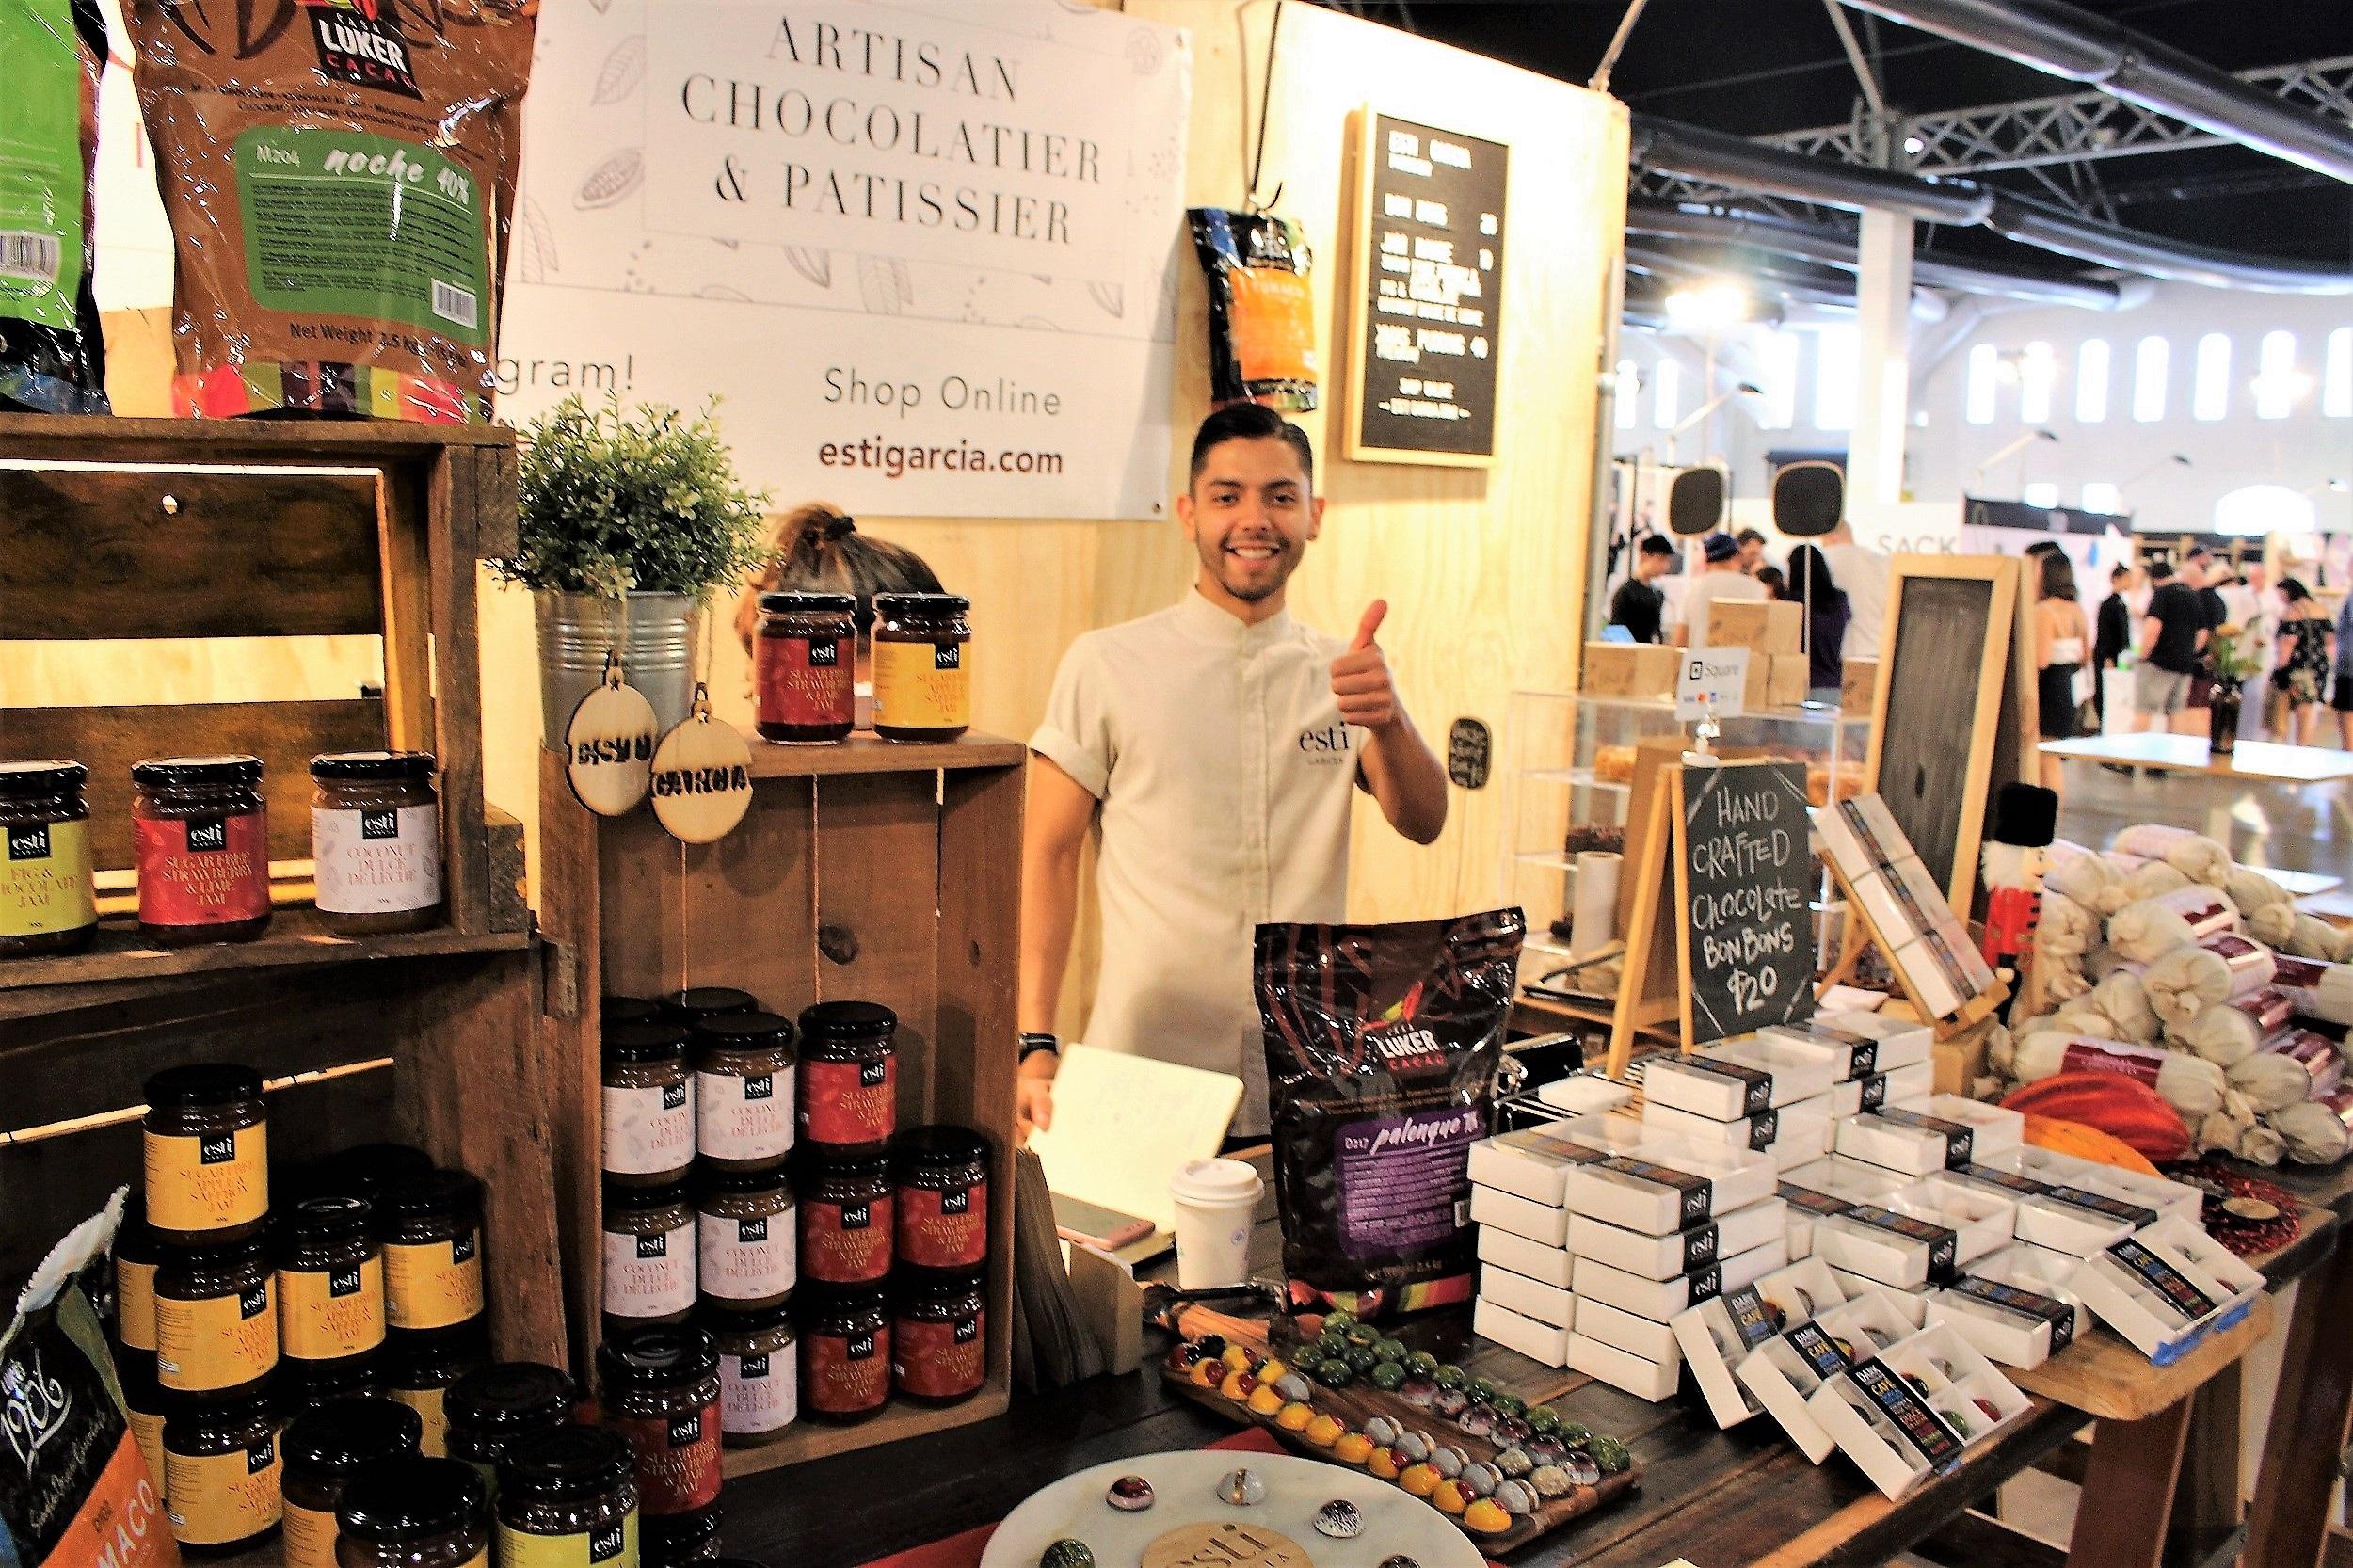 Artisan chocolatier/patissier Esti Garcia and his exquisite products